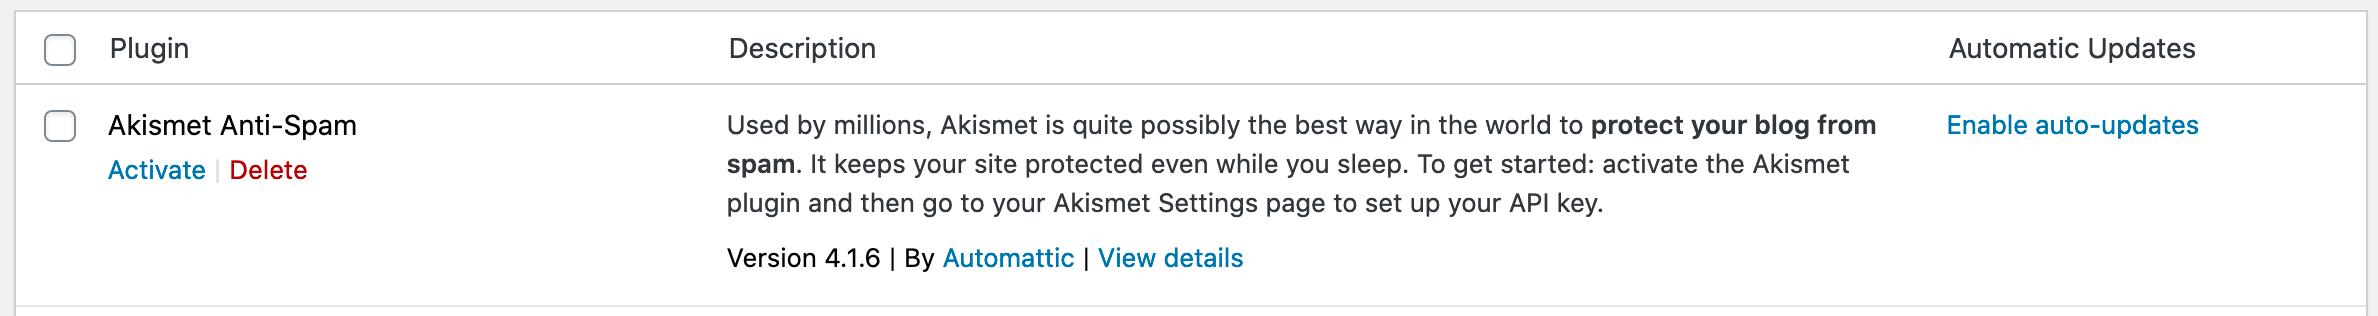 wordpress auto update plugins